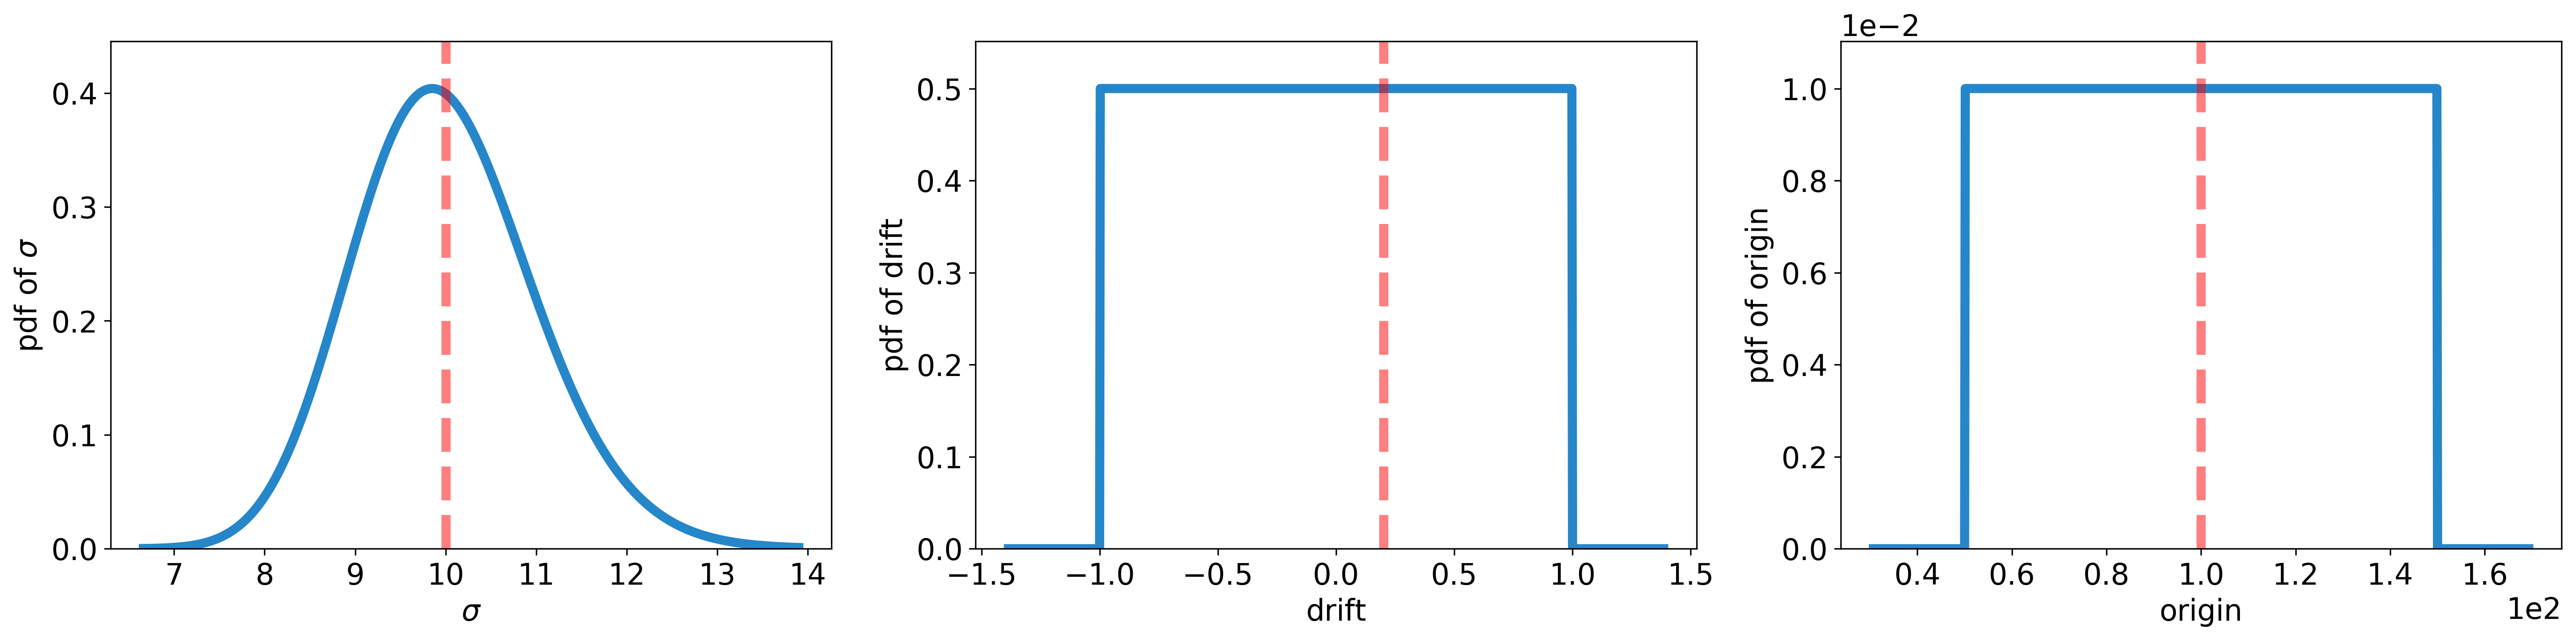 docs/_static/randomwalk/randomwalk_distributions-prior.png